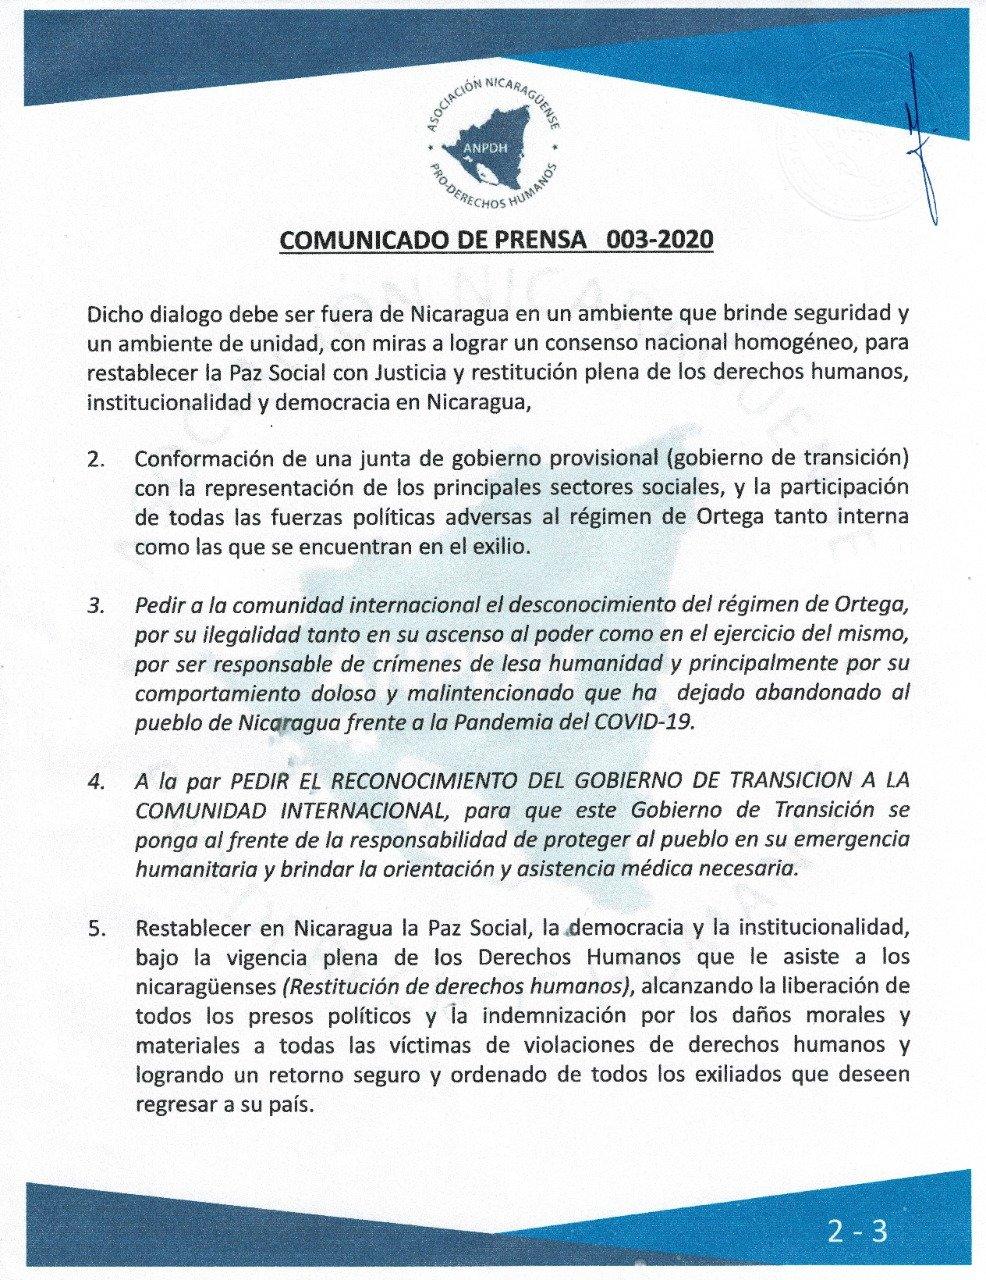 COMUNICADO-DE-PRENSA-03-2020-02.jpg